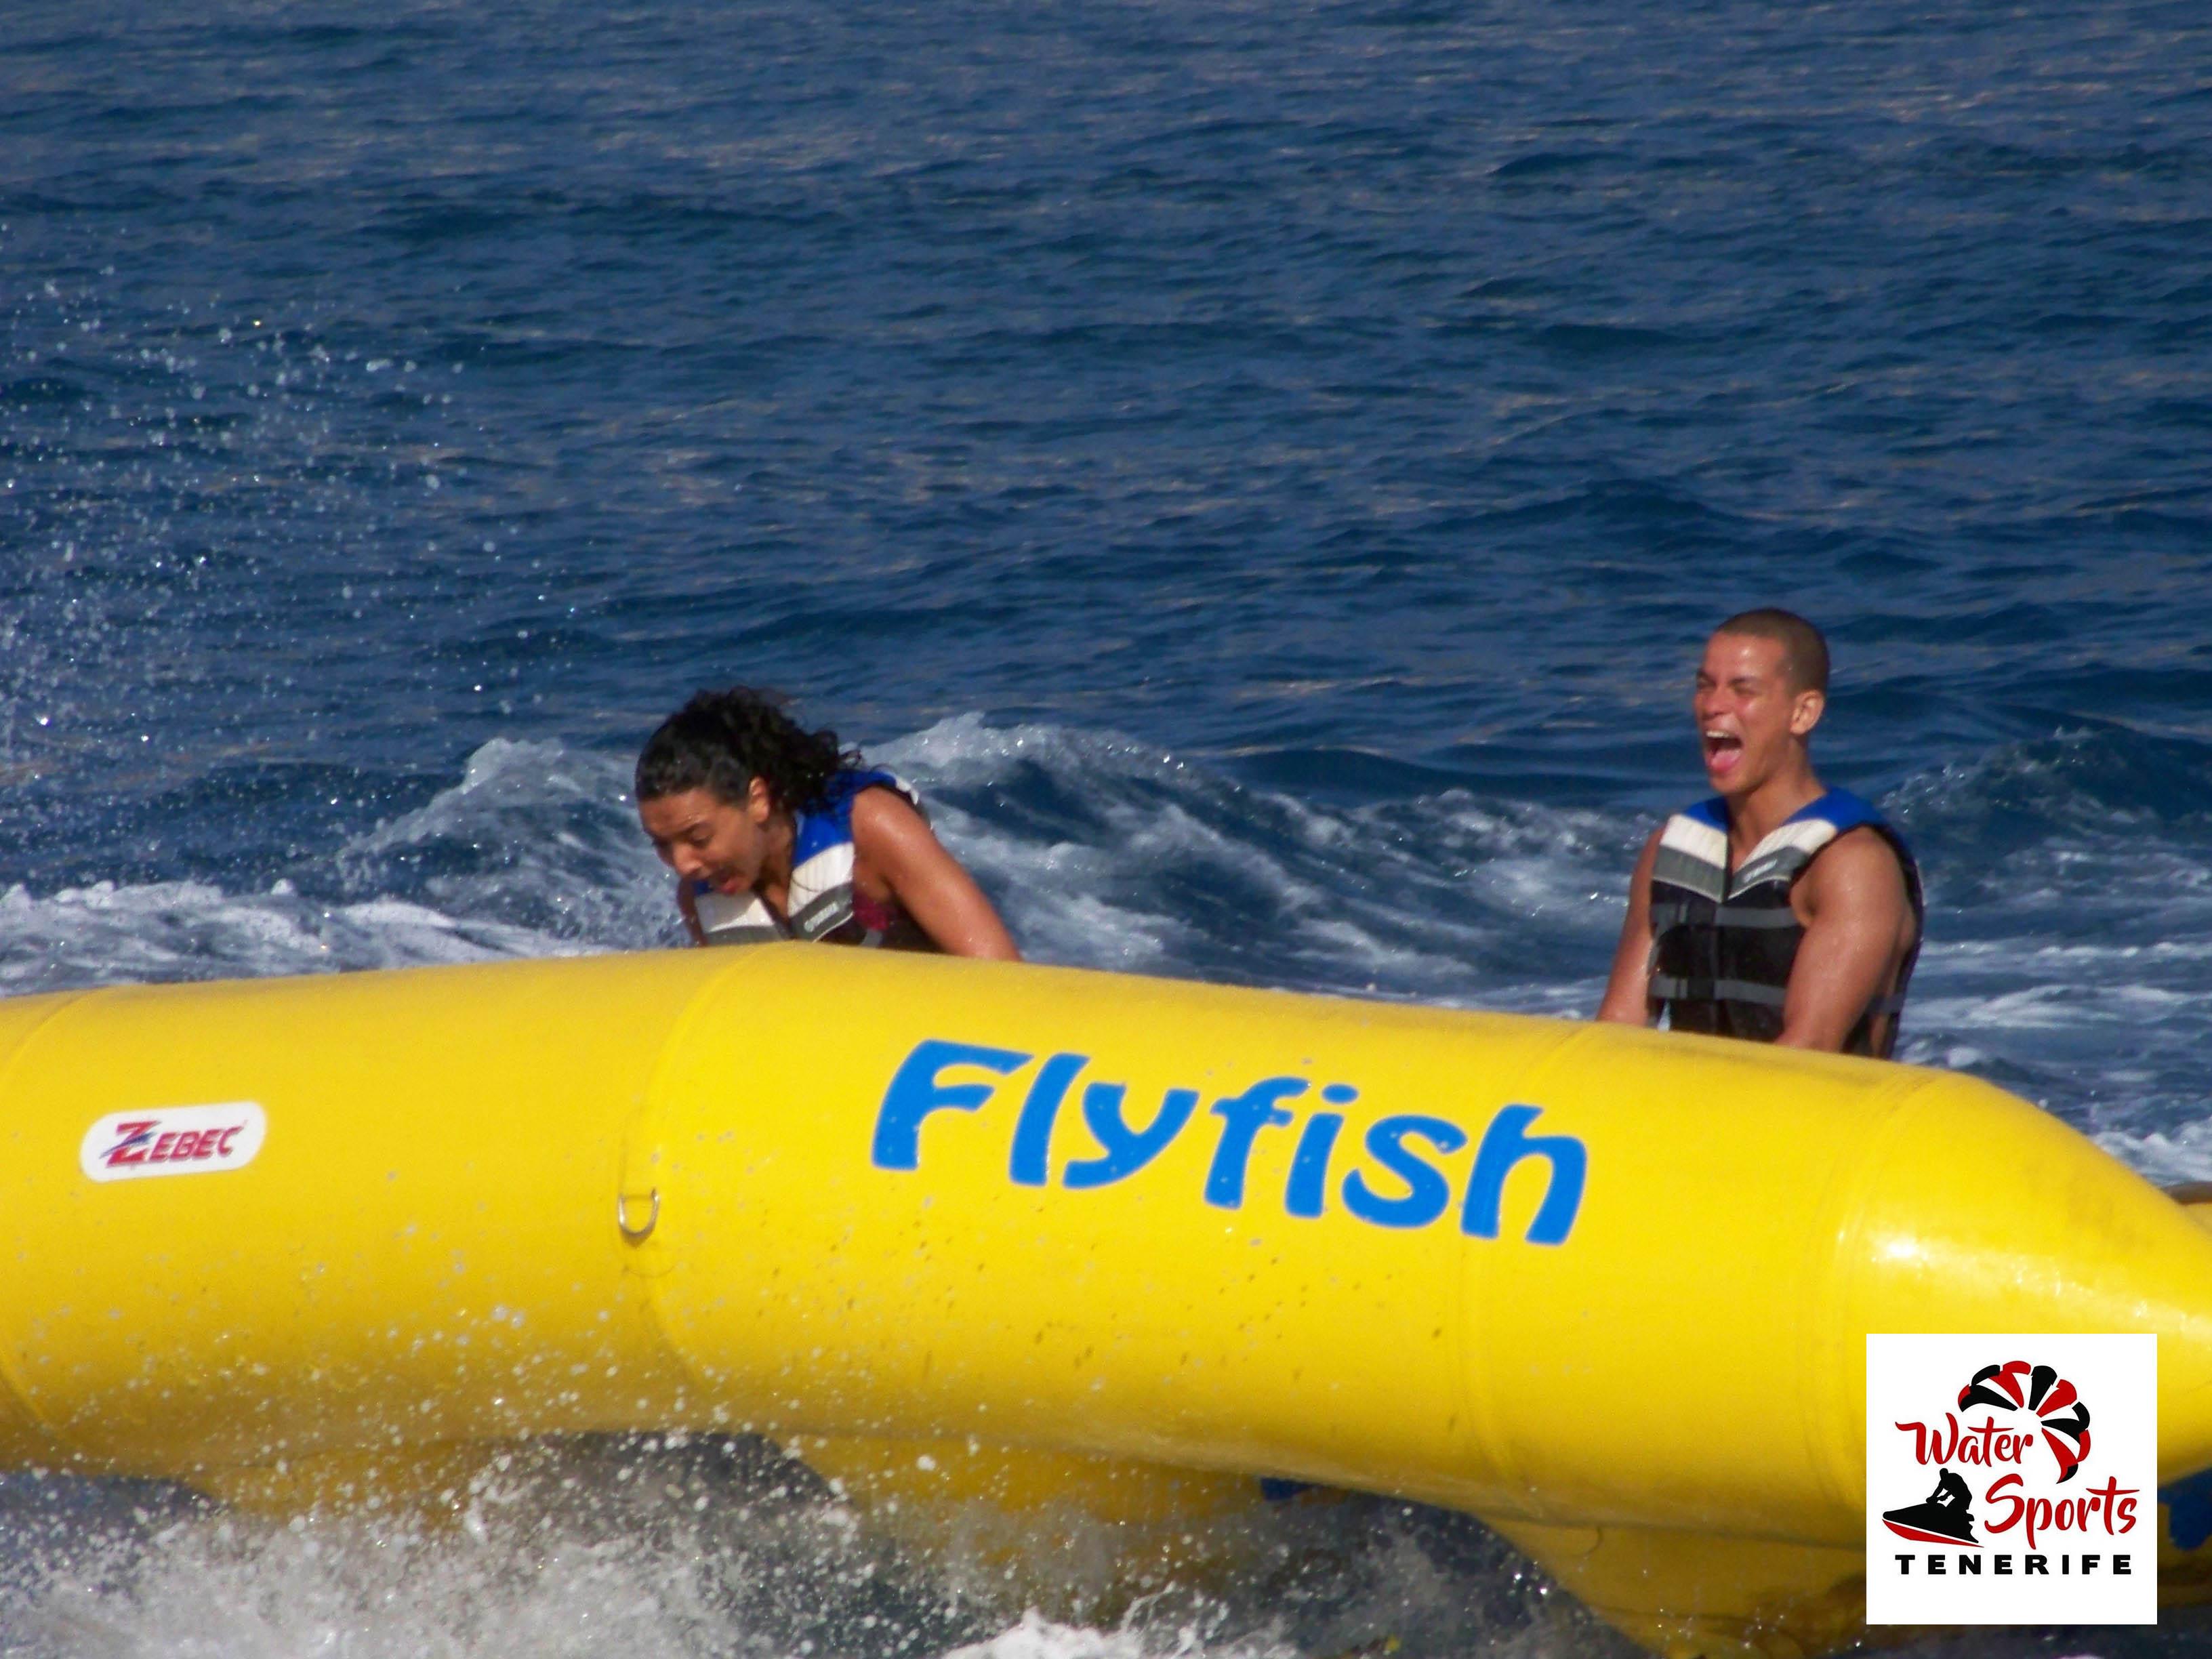 flyfish watersport tenerife sur